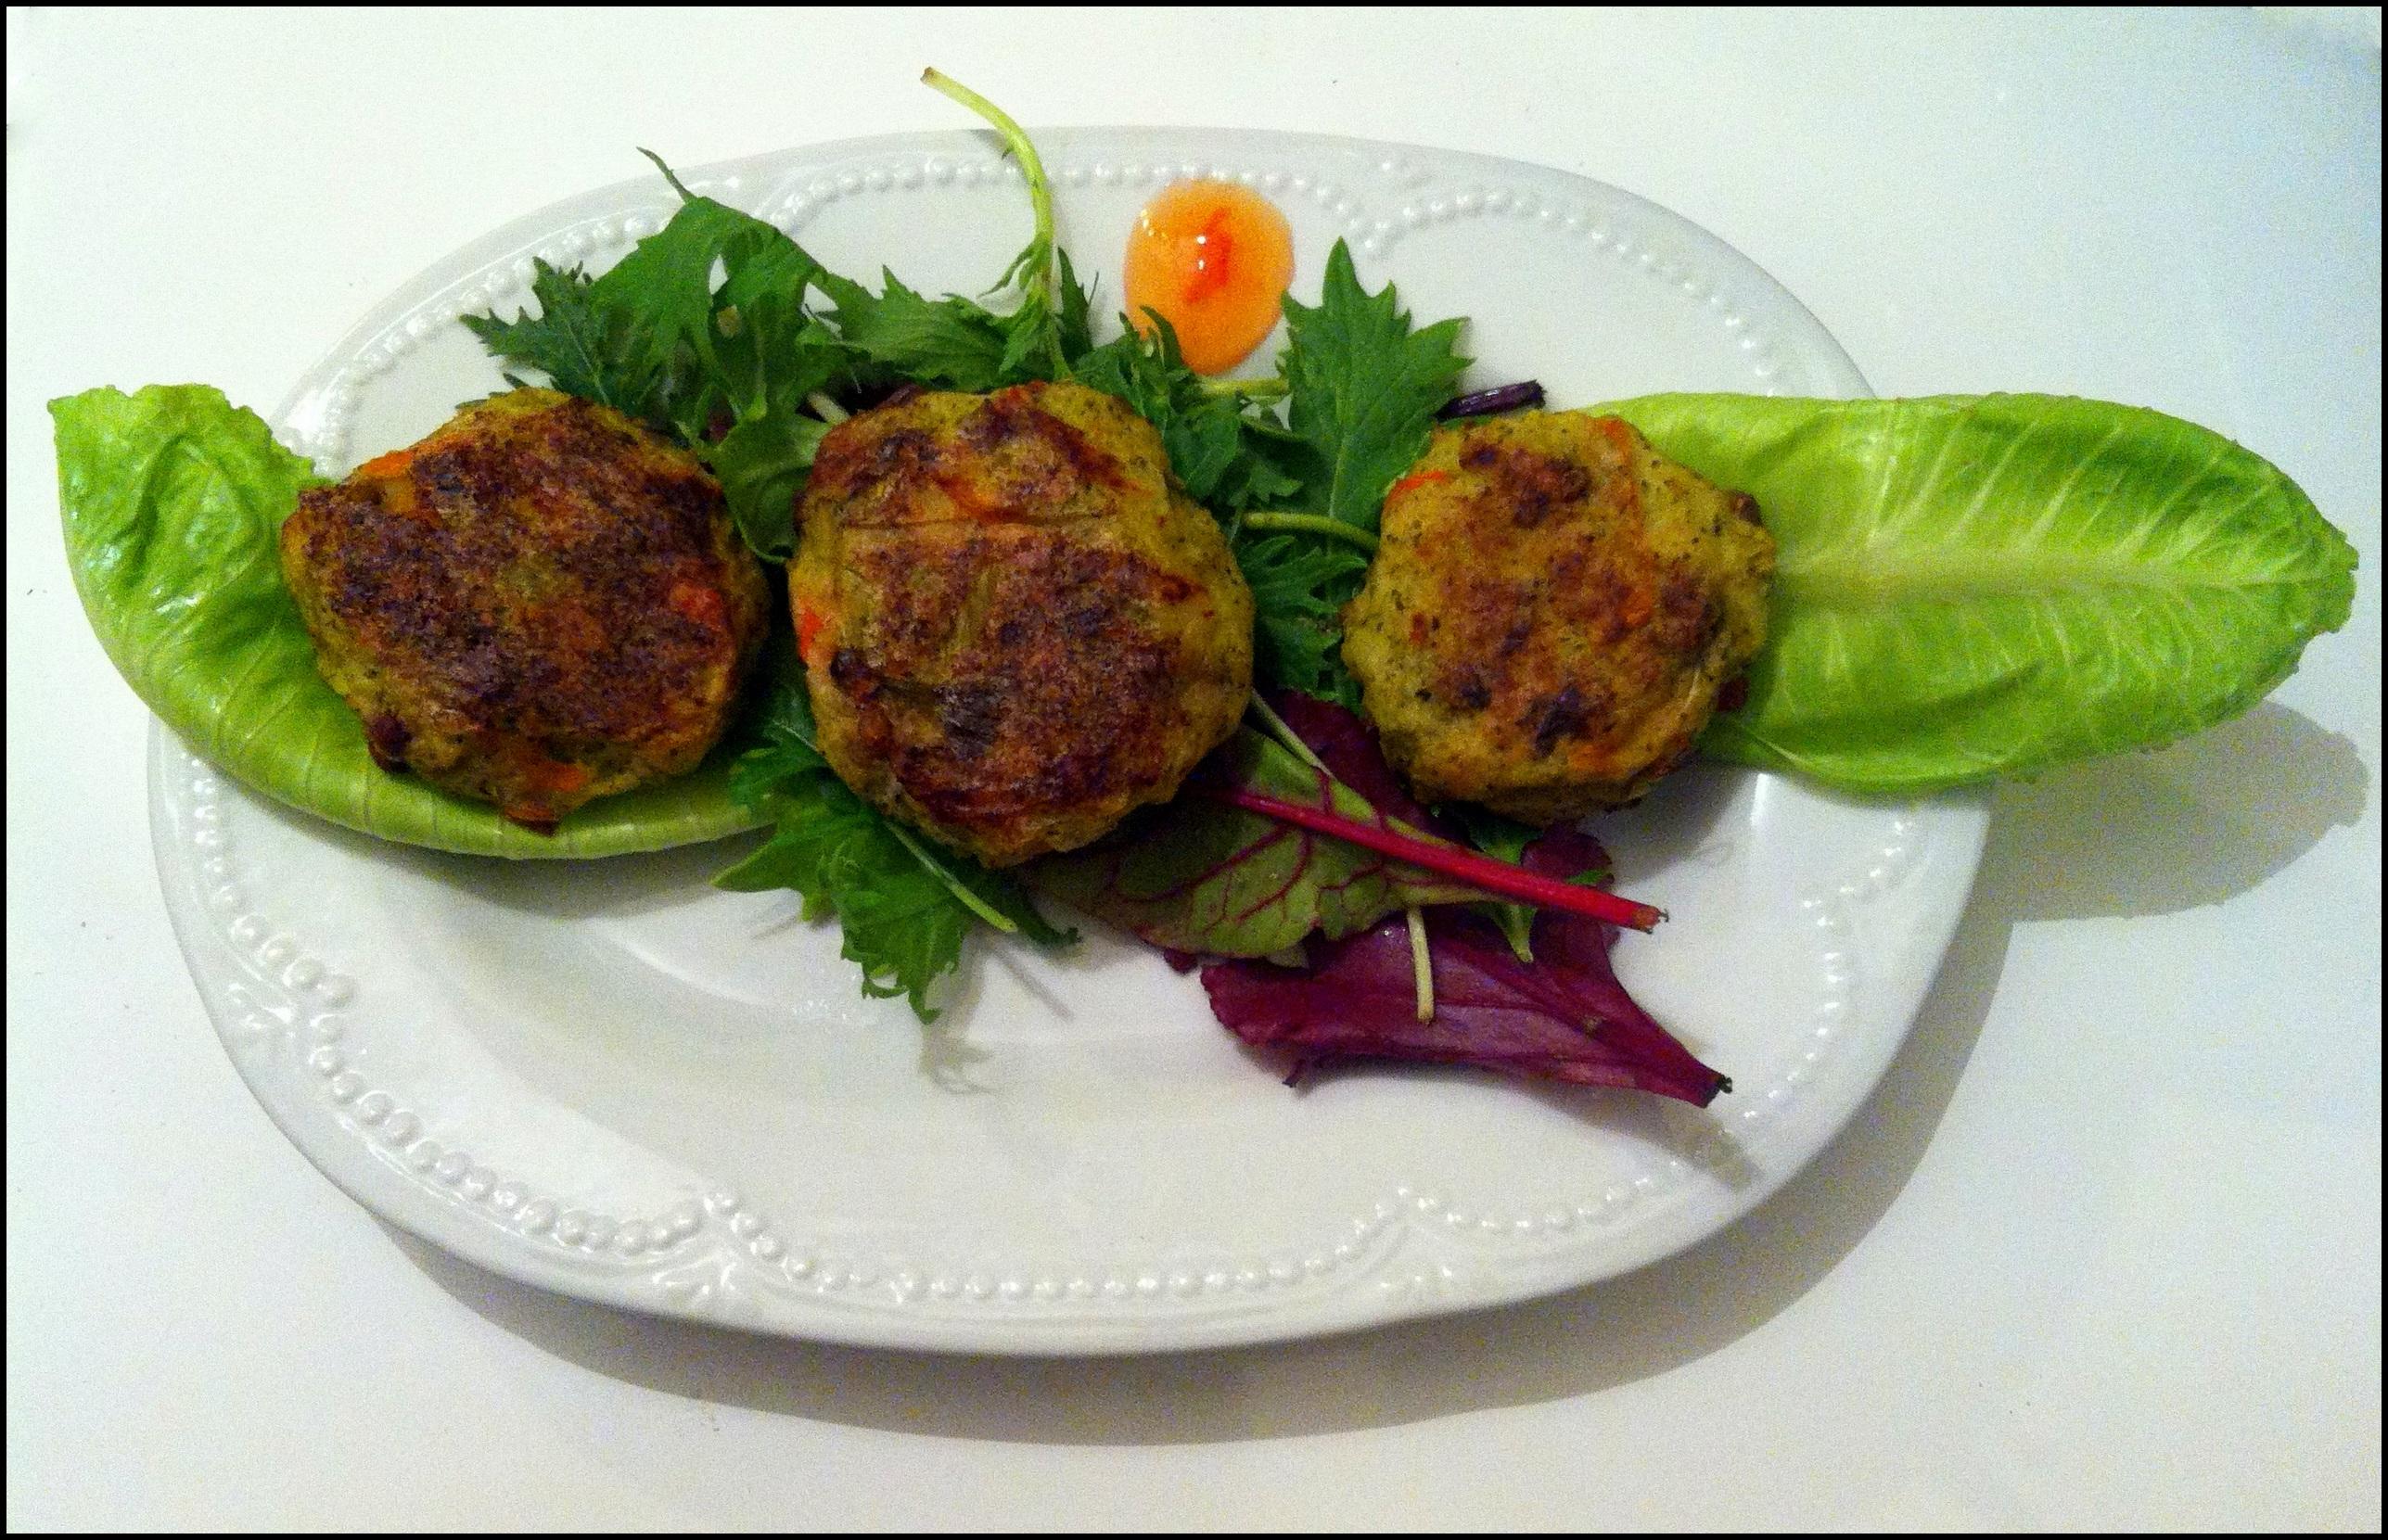 Potatoes and vegetable baked vegan patties